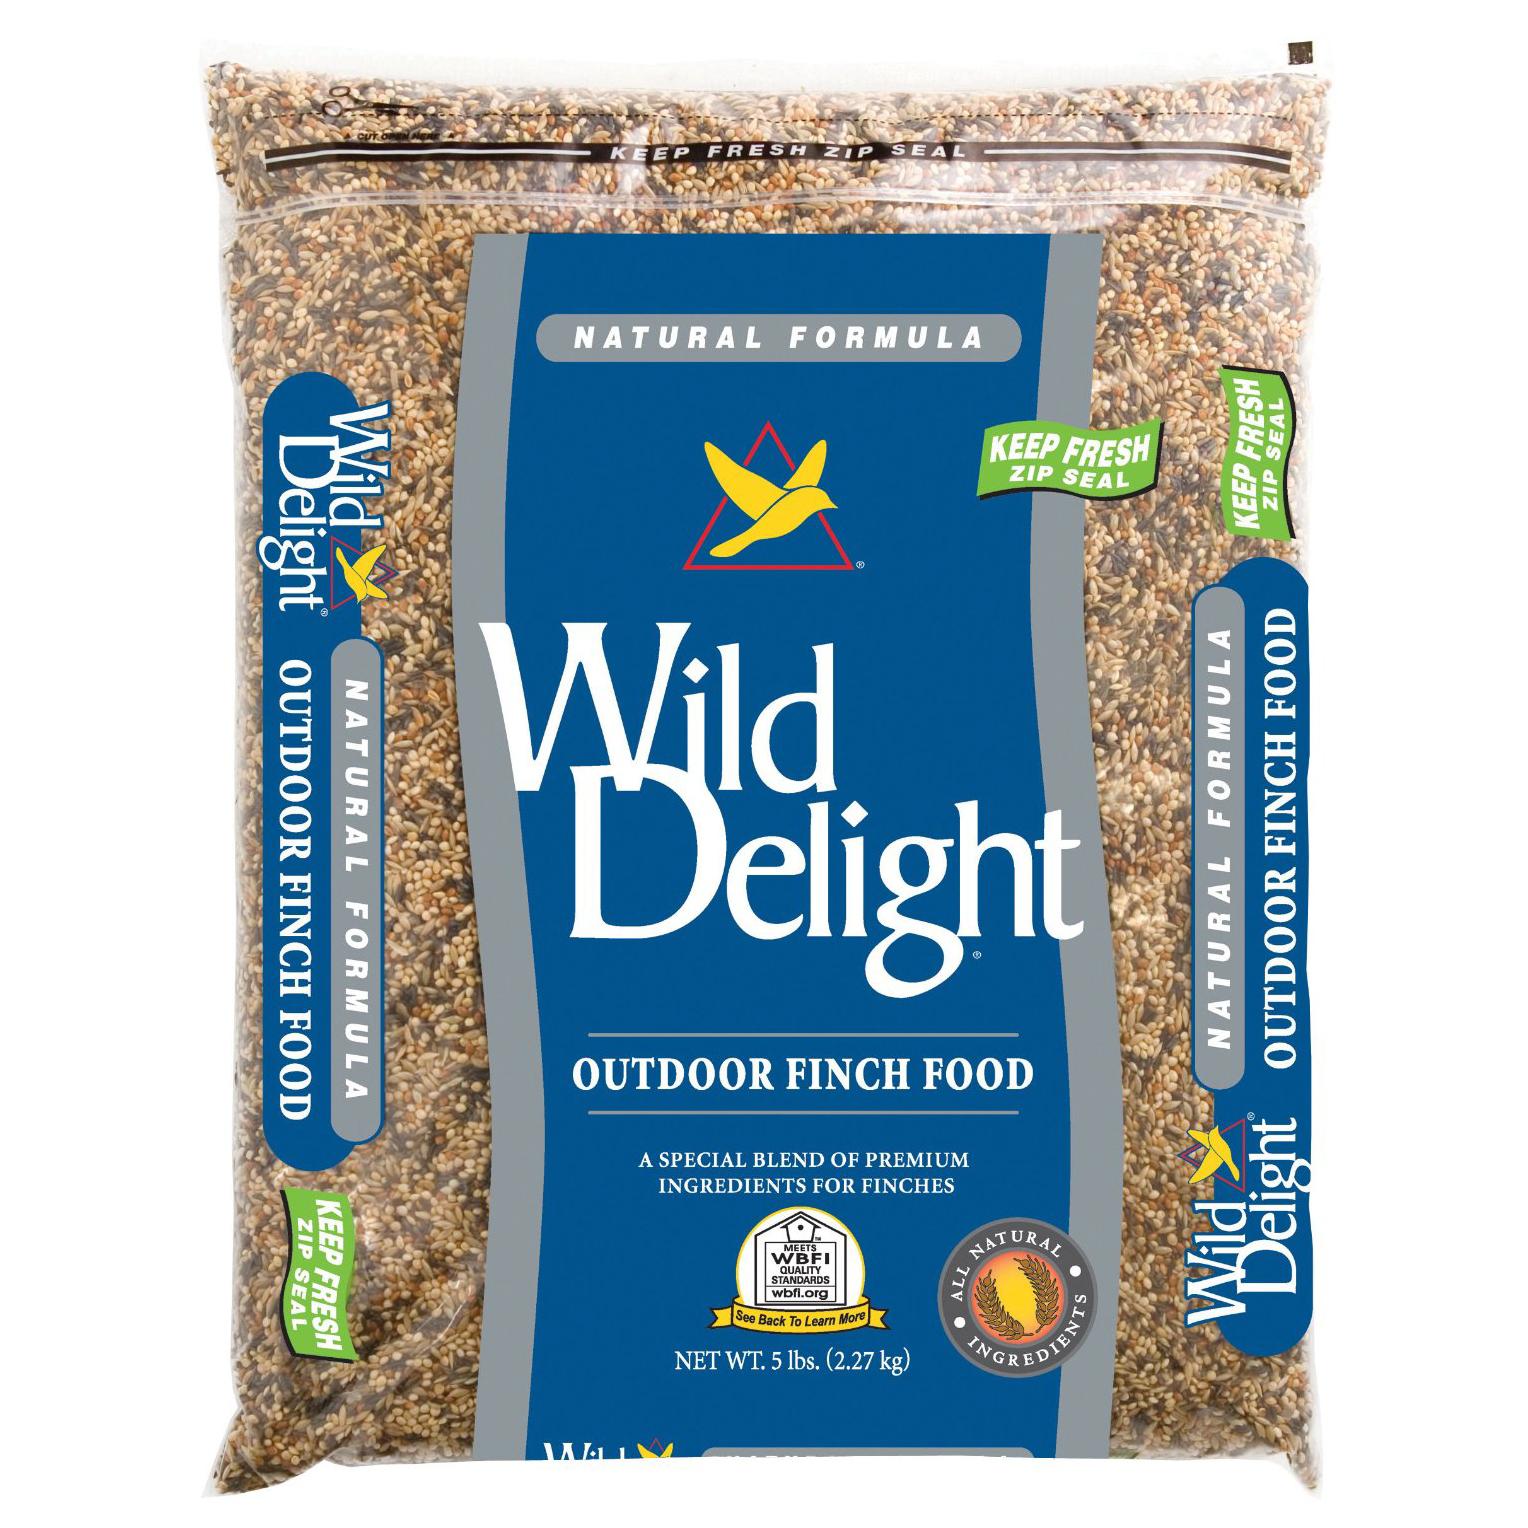 wild delight outdoor finch food 5 lb